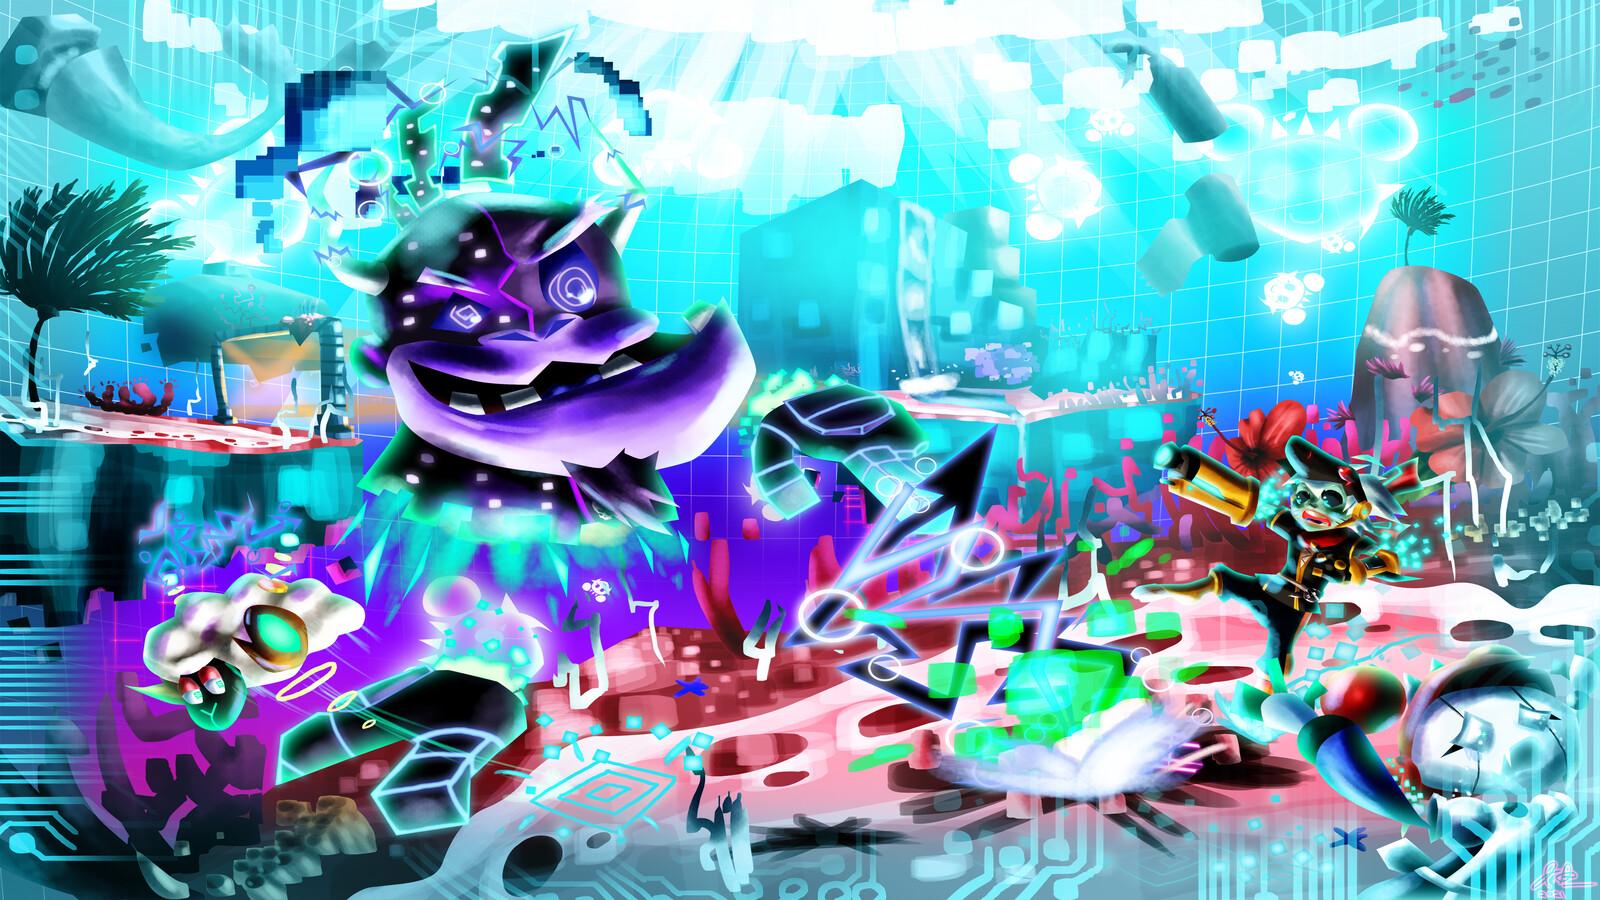 Project Amabie: Gorilla Malware Boss Concept